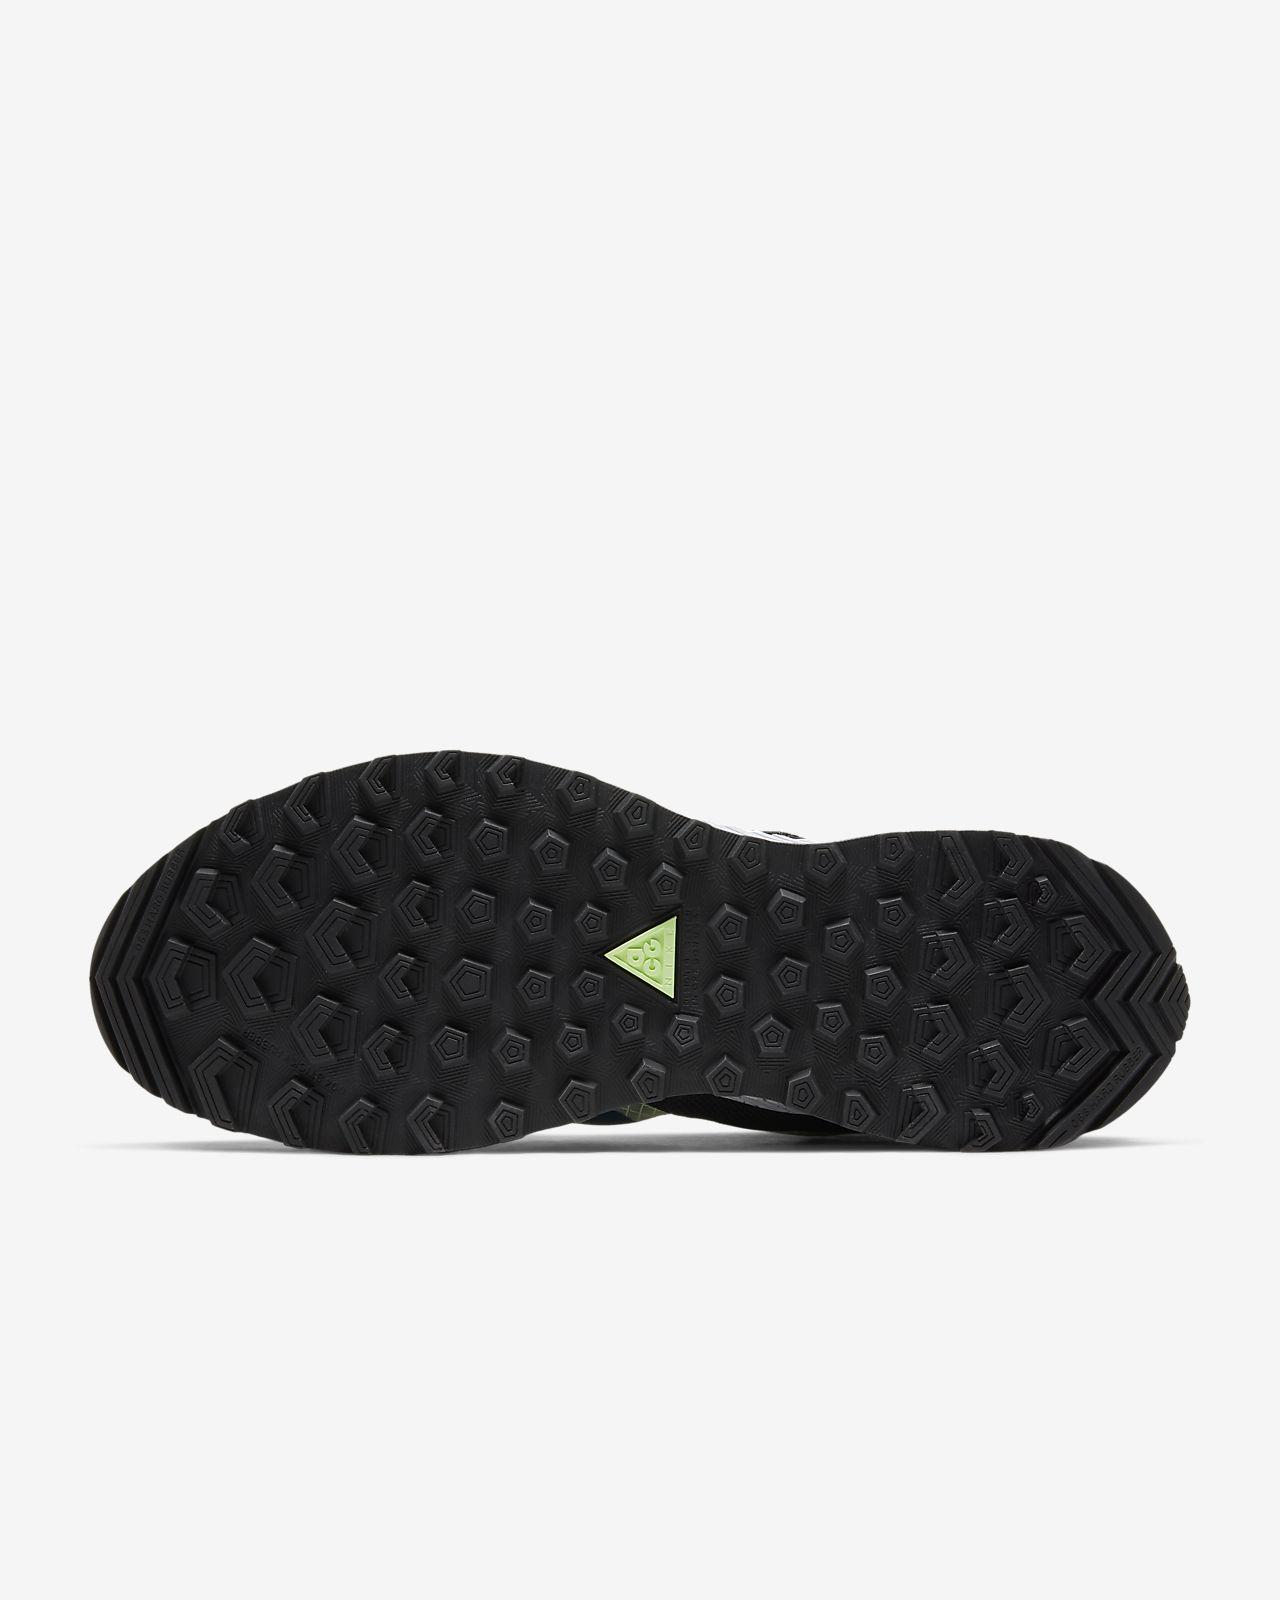 Nike ACG Zoom Terra Zaherra sko til mænd. Nike DK